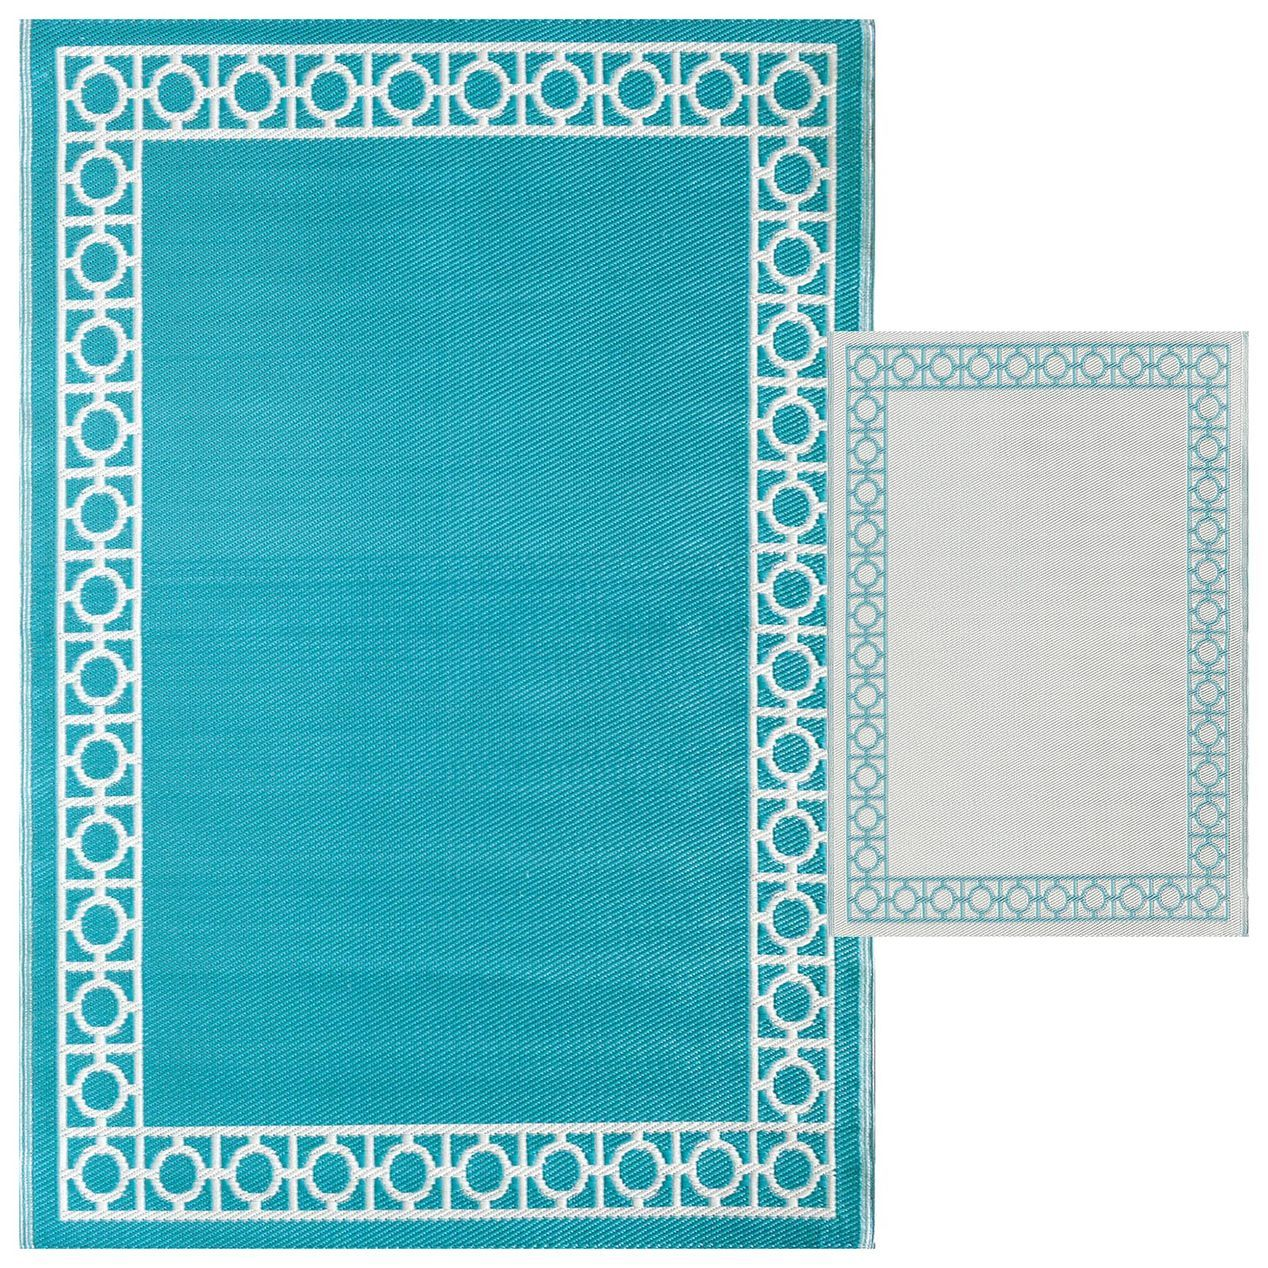 aqua outdoor woven area rug 5x7 area